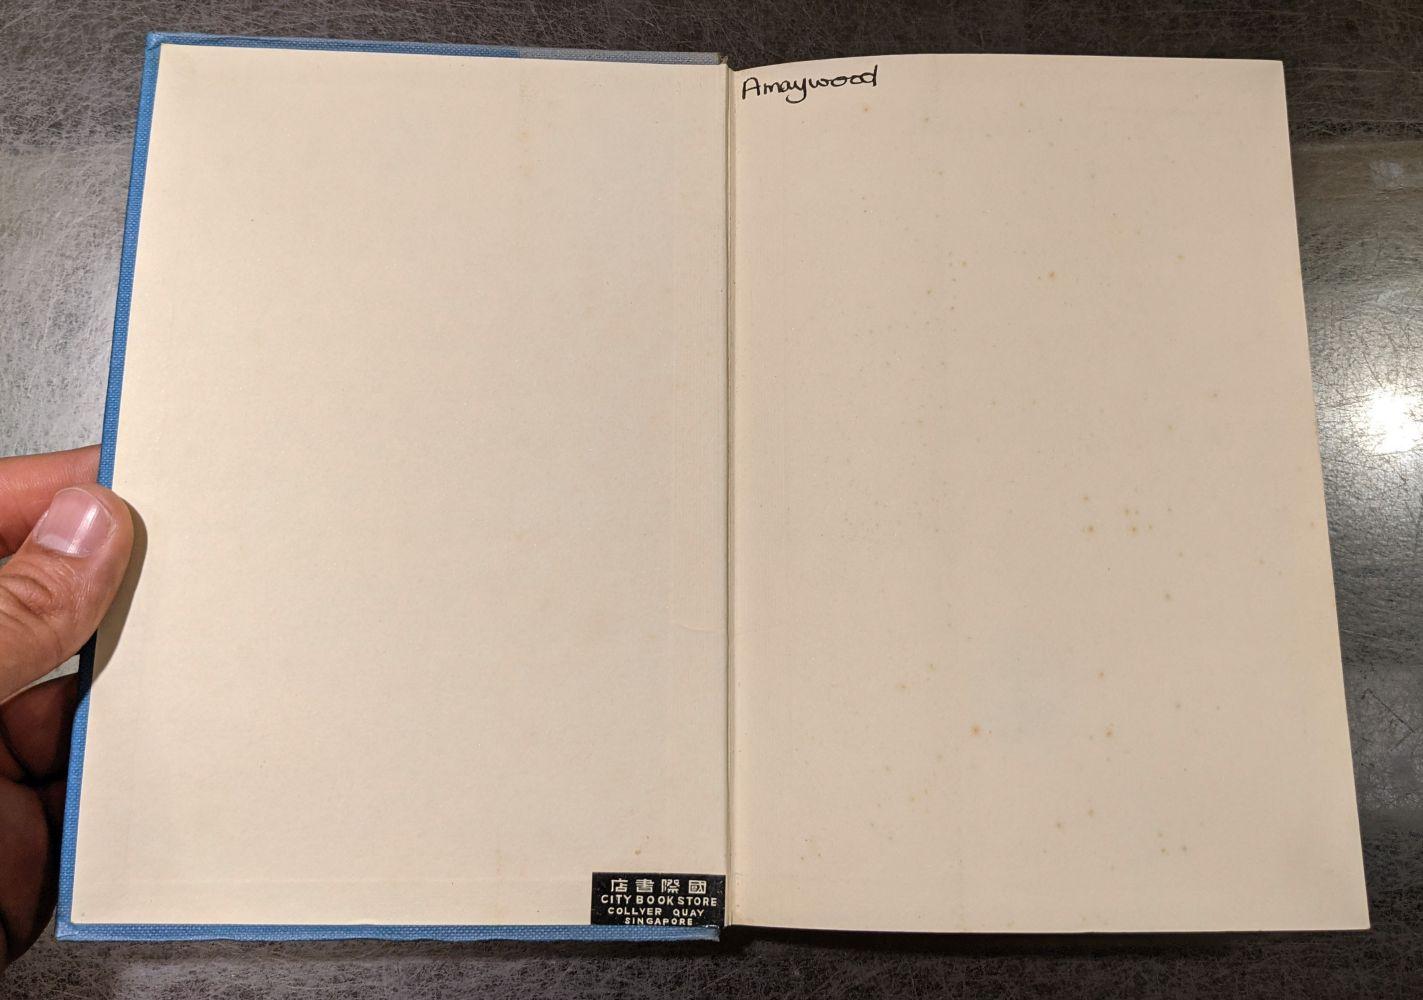 Lewis (C.S.) The Last Battle, 1st edition, 1956 - Image 6 of 9